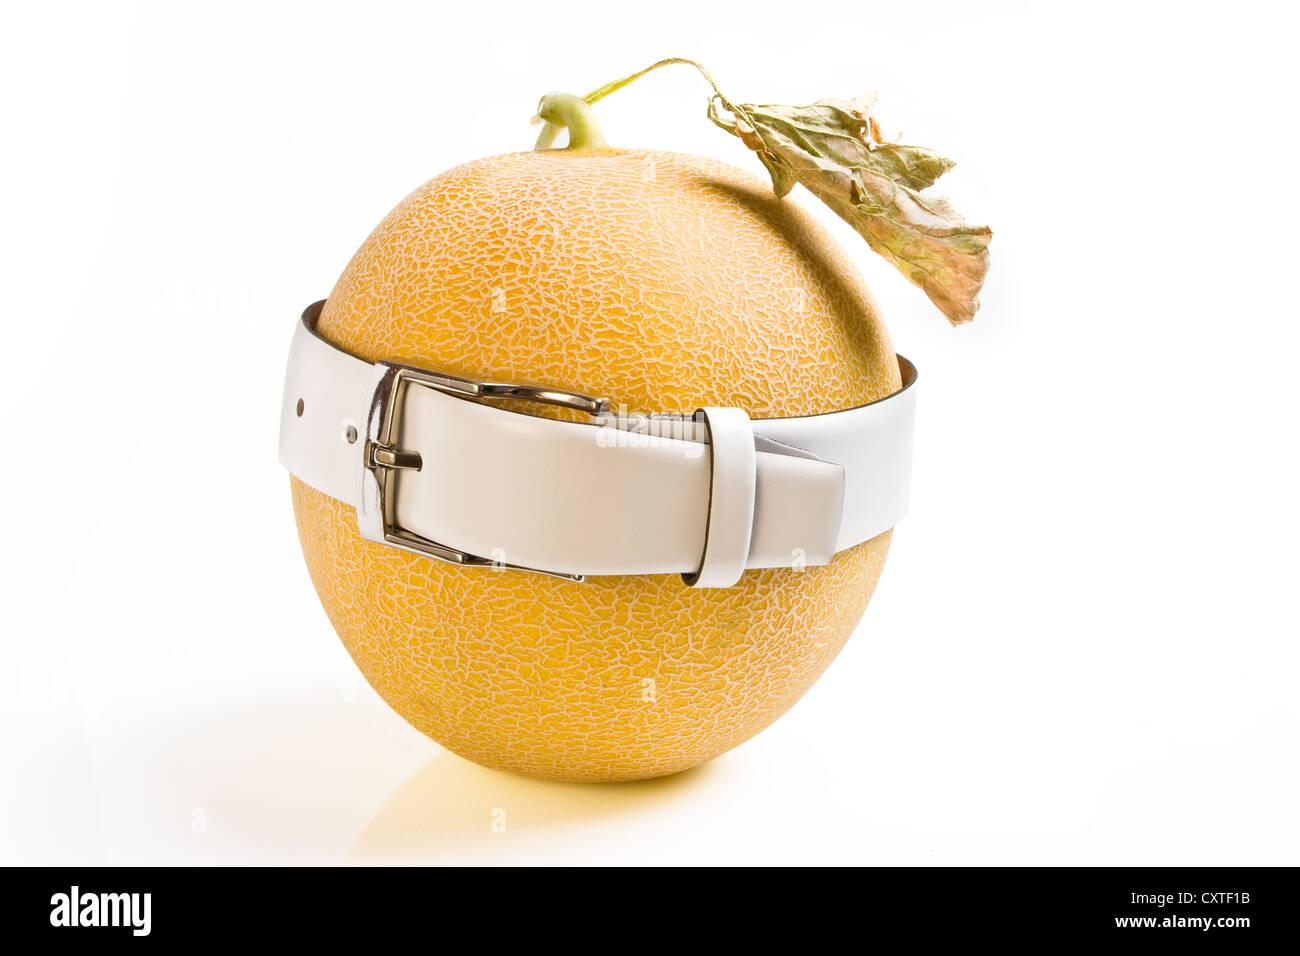 Fat wrinkle melon - Stock Image